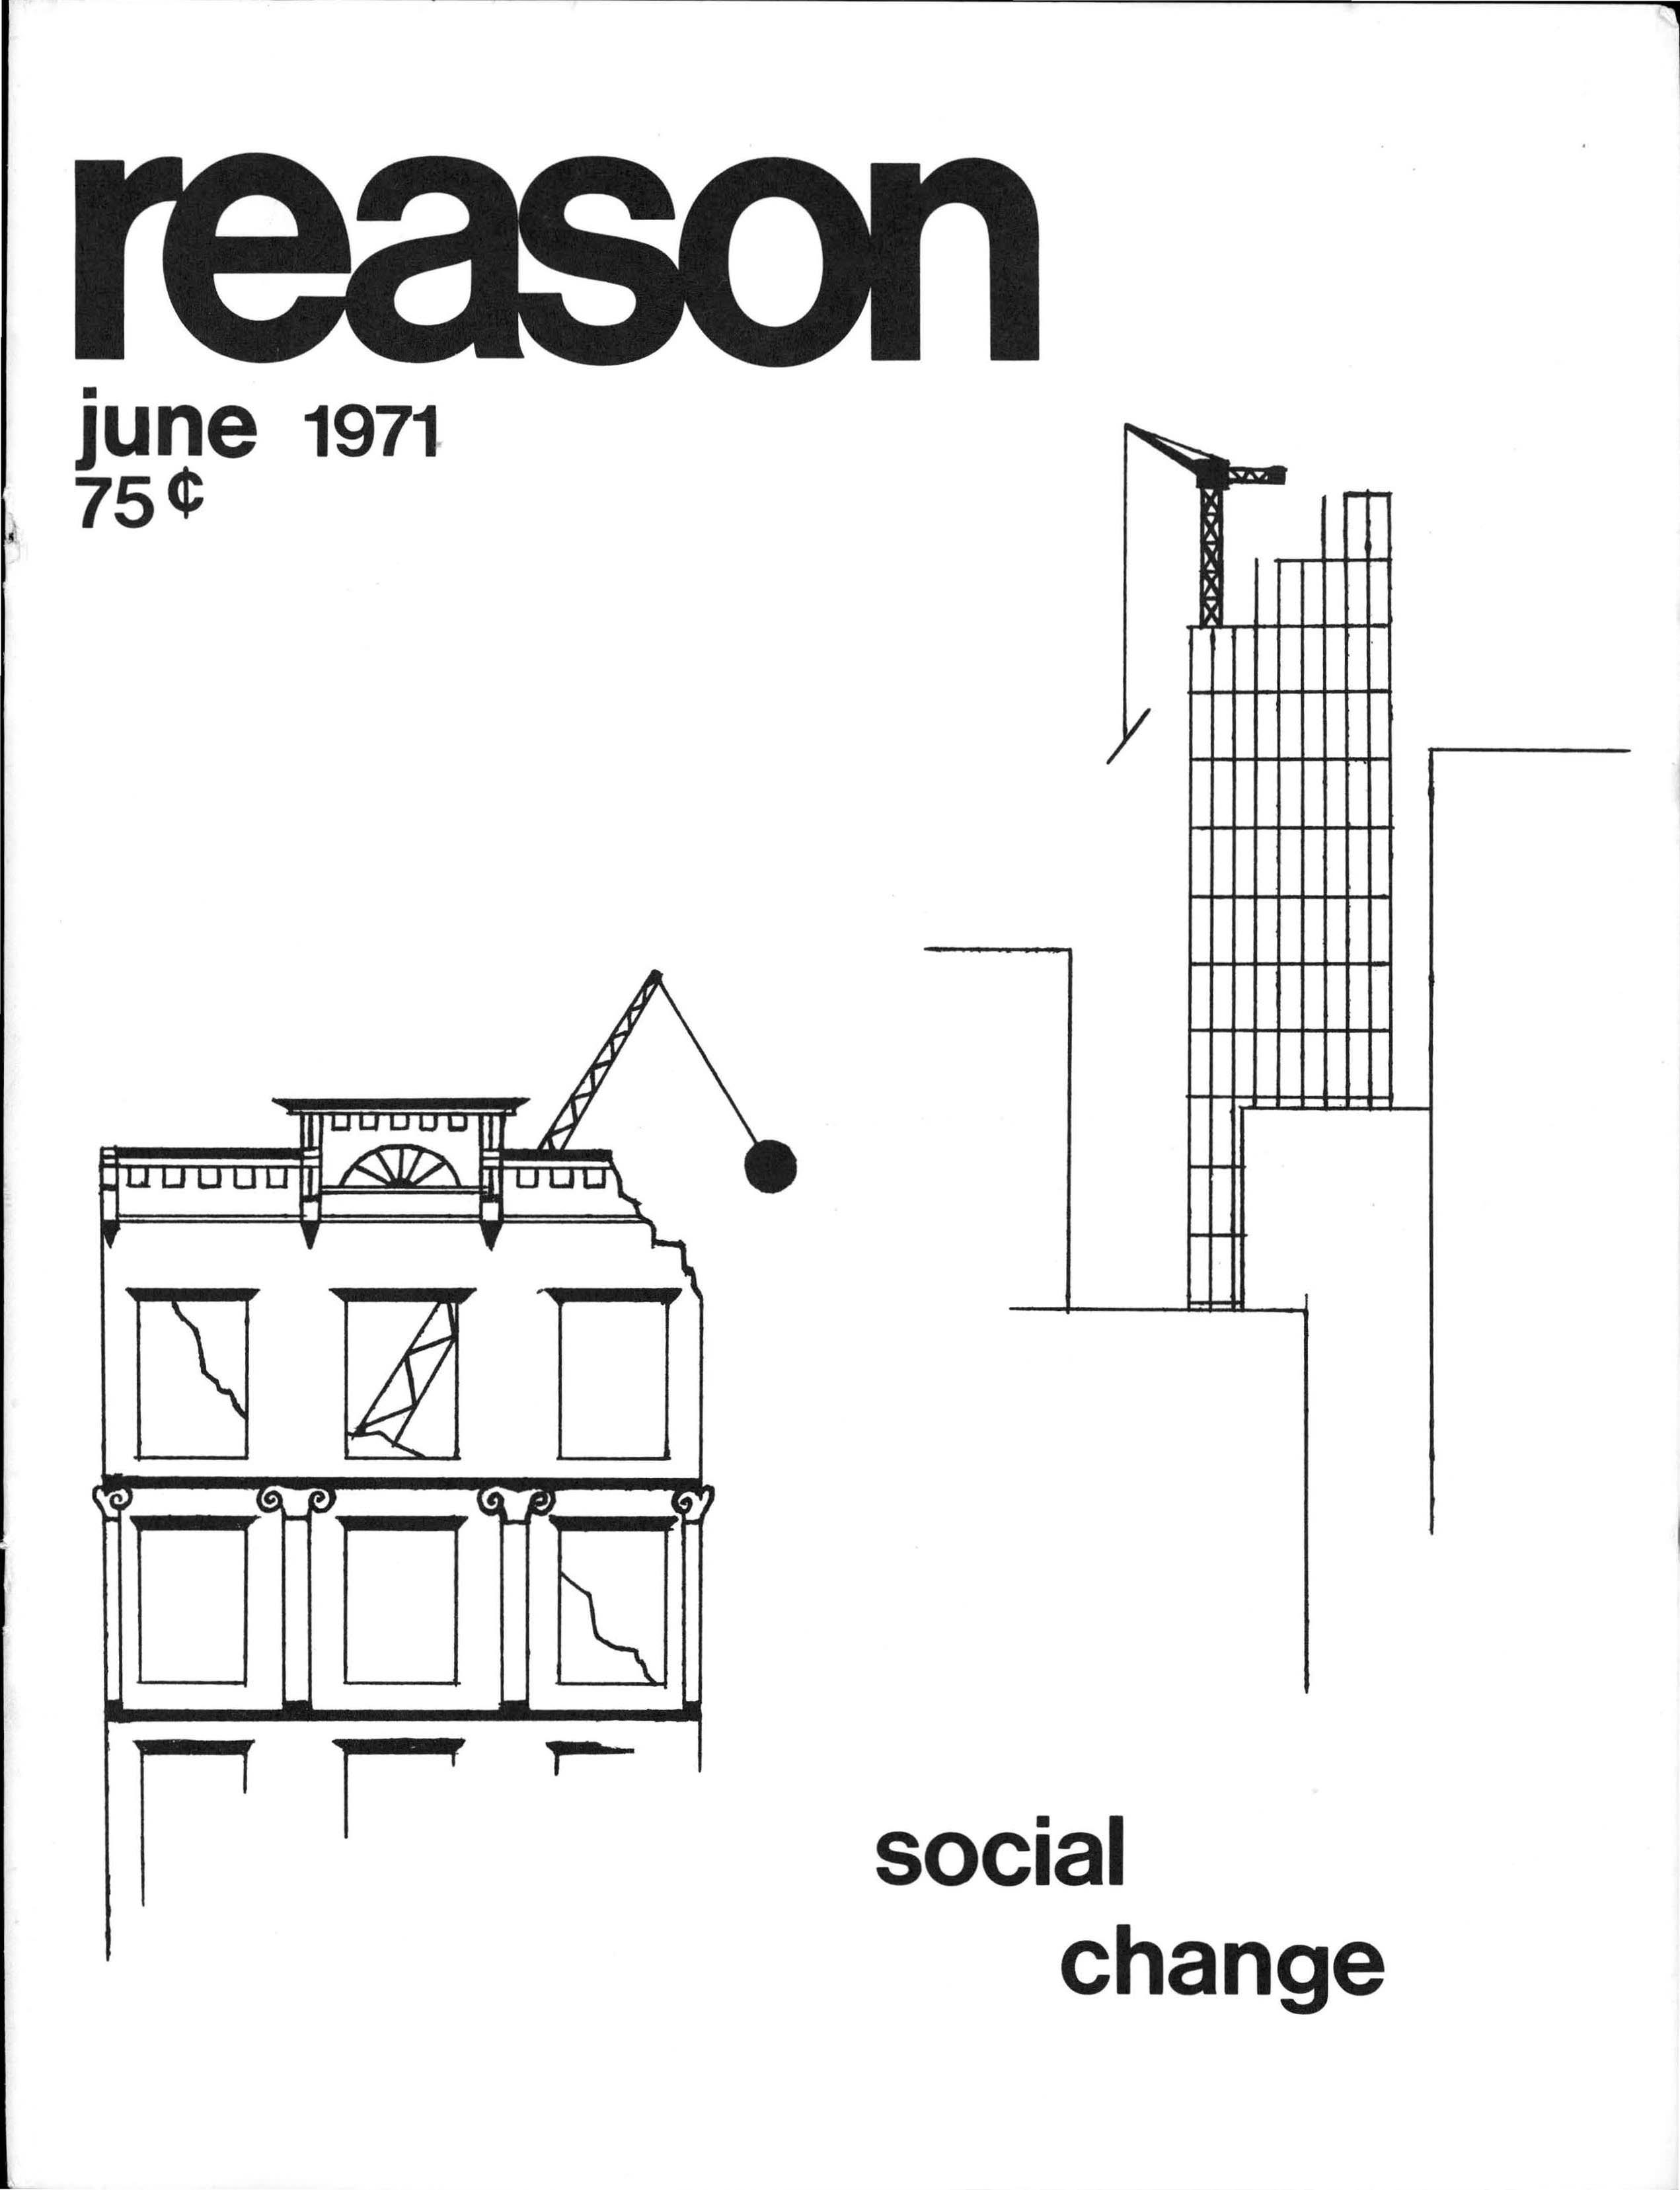 Reason Magazine, June 1971 cover image